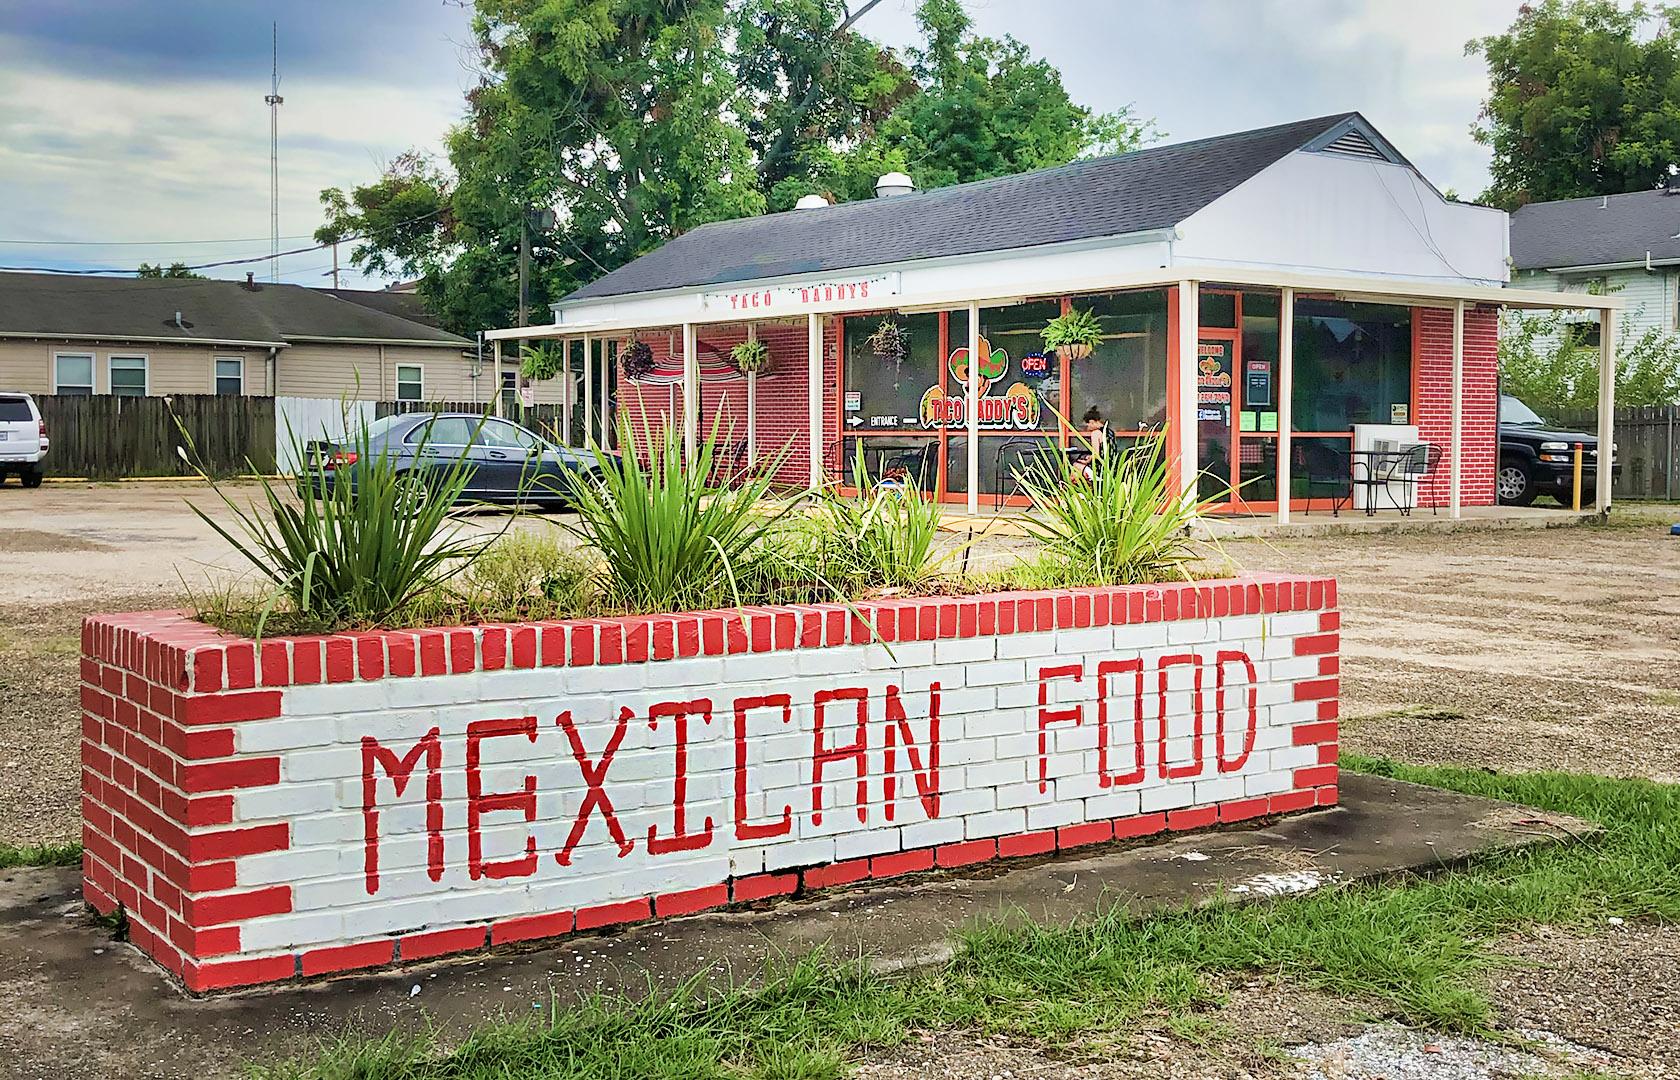 taco daddy's tex mex gretna, nola place photo - august 2020